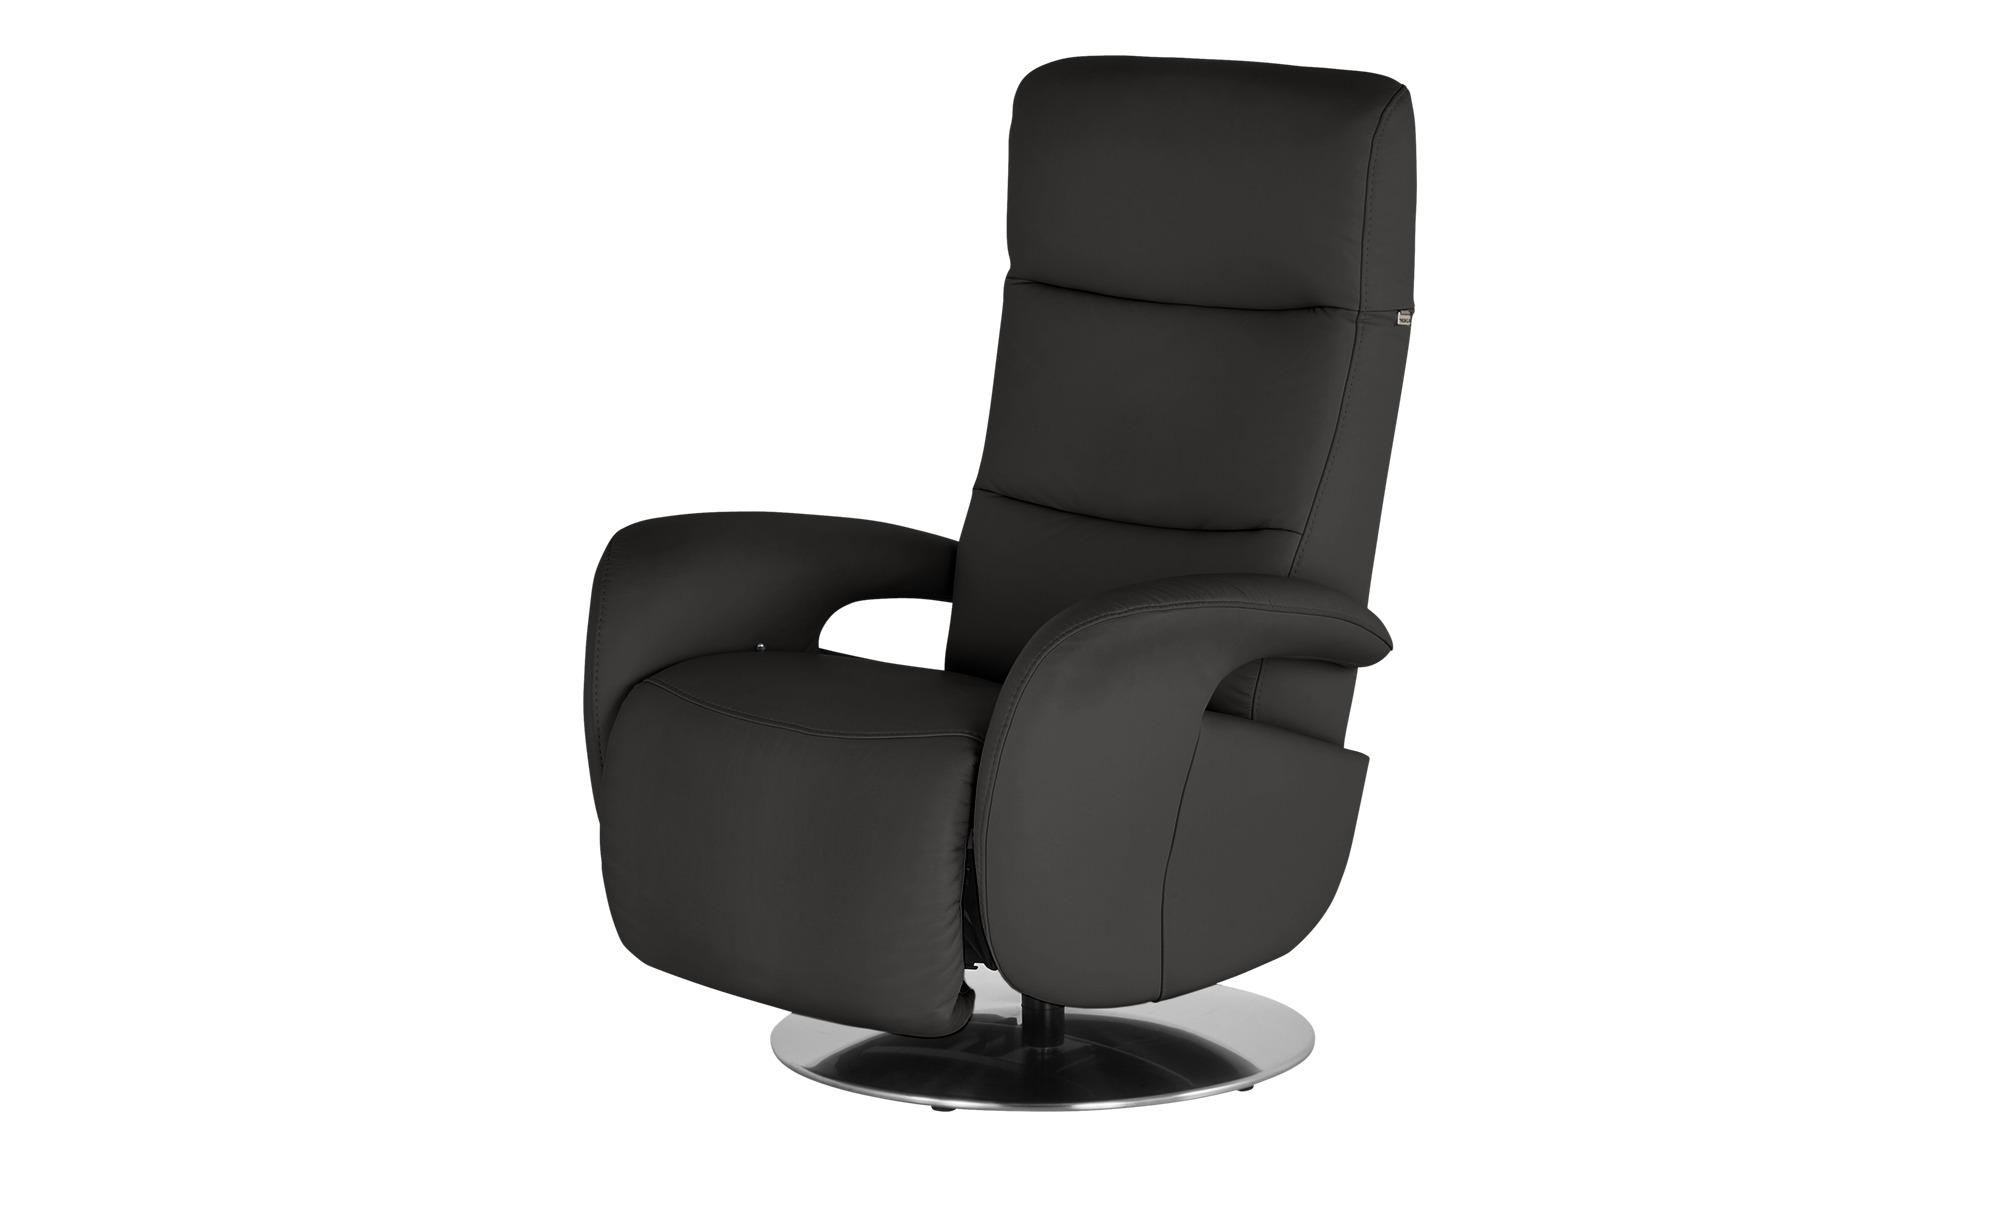 Hukla Relaxsessel  Andy ¦ schwarz ¦ Maße (cm): B: 79 H: 110 T: 85 Polstermöbel > Sessel > Fernsehsessel - Höffner